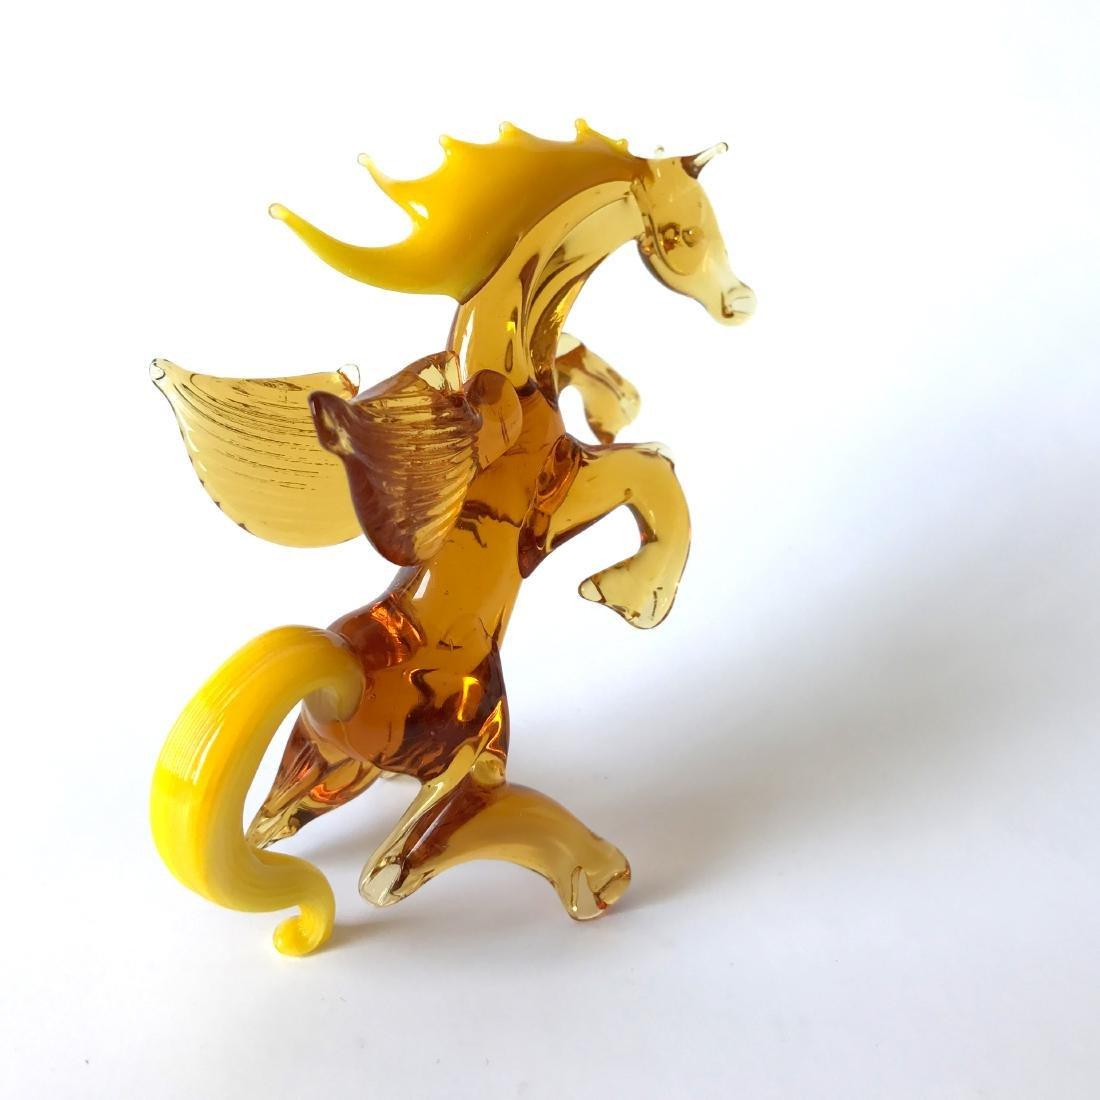 Figurine of Pegasus the winged horse amber coloured - 2